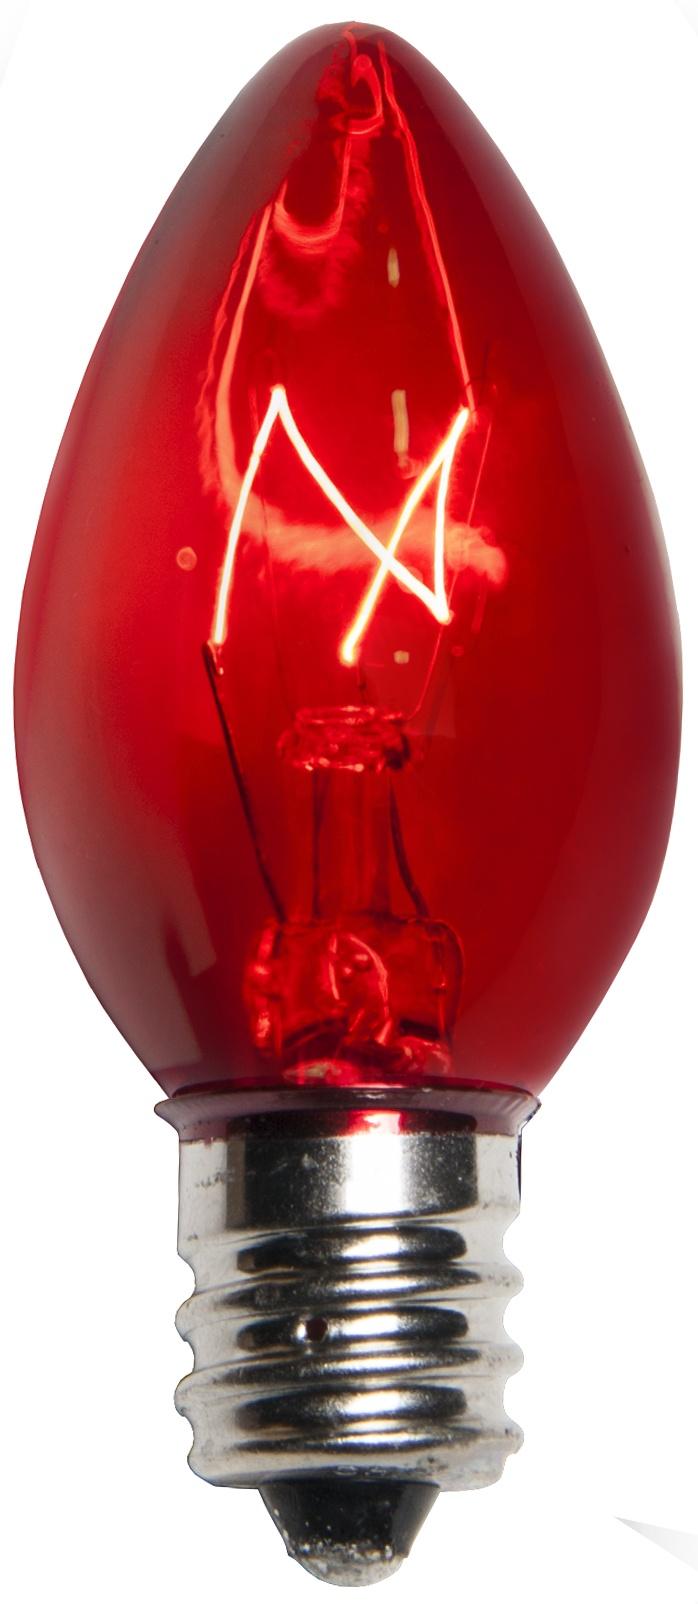 Box of 25 C7 Red Triple Dipped Transparent Christmas Bulbs 5 Watt